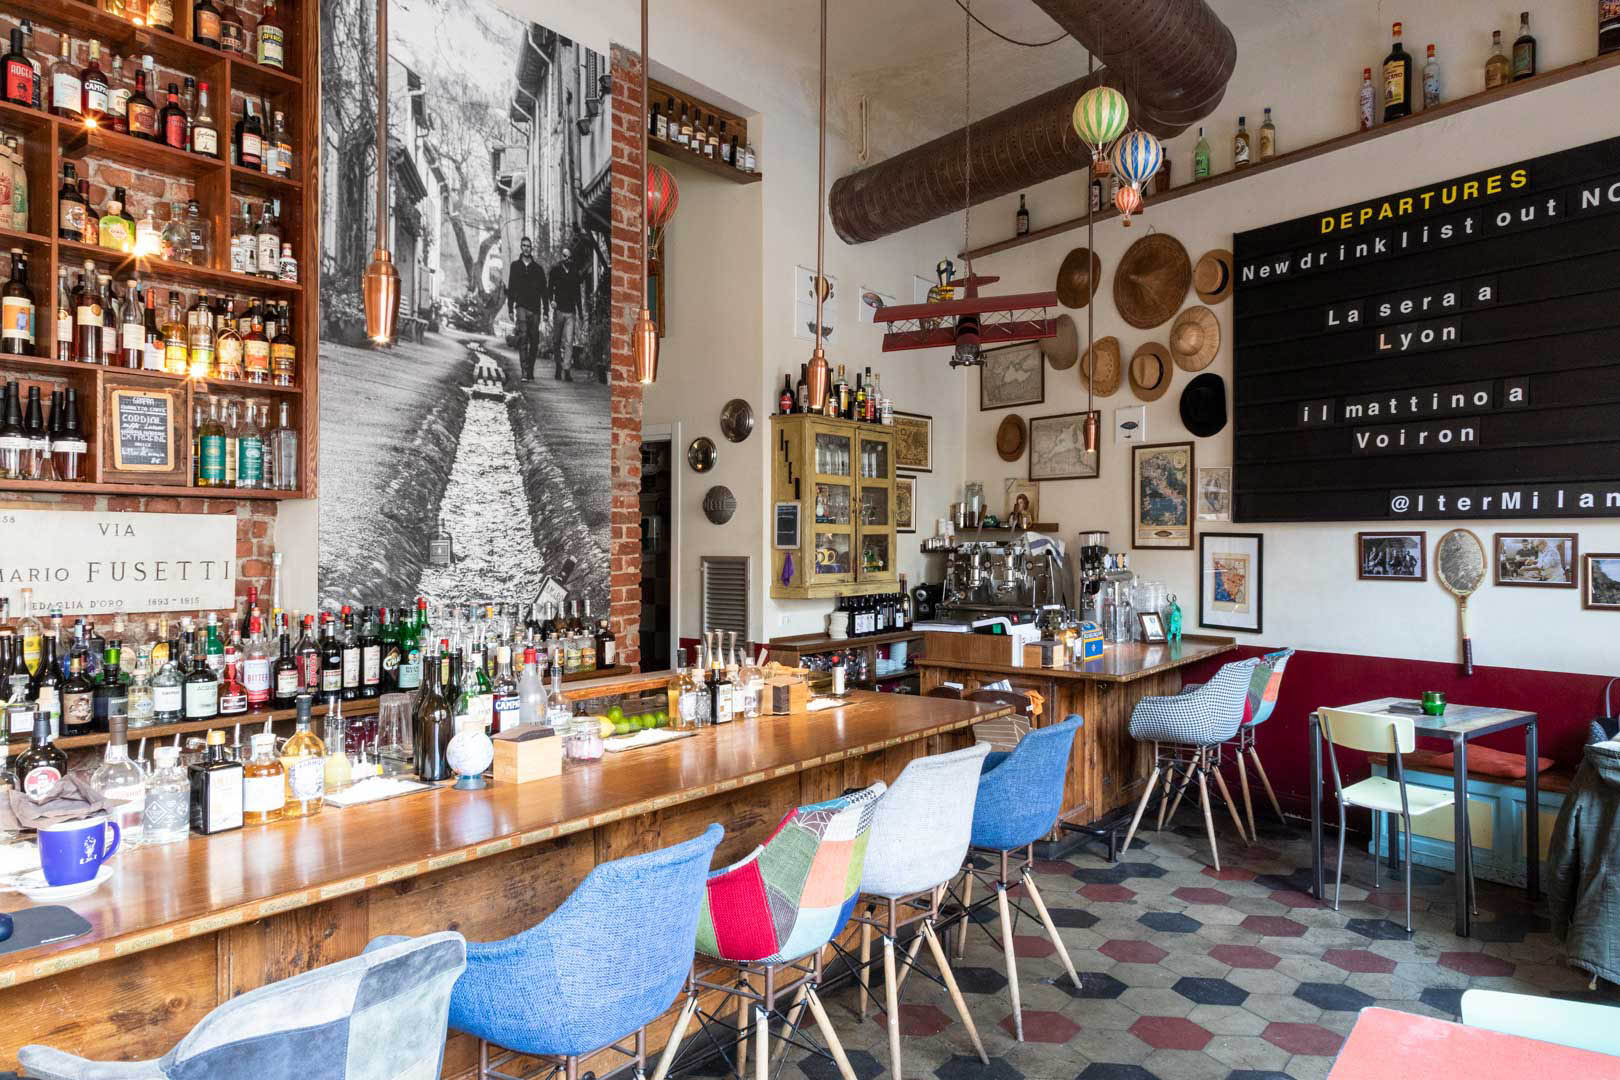 I Migliori Cocktail Bar Zona Navigli